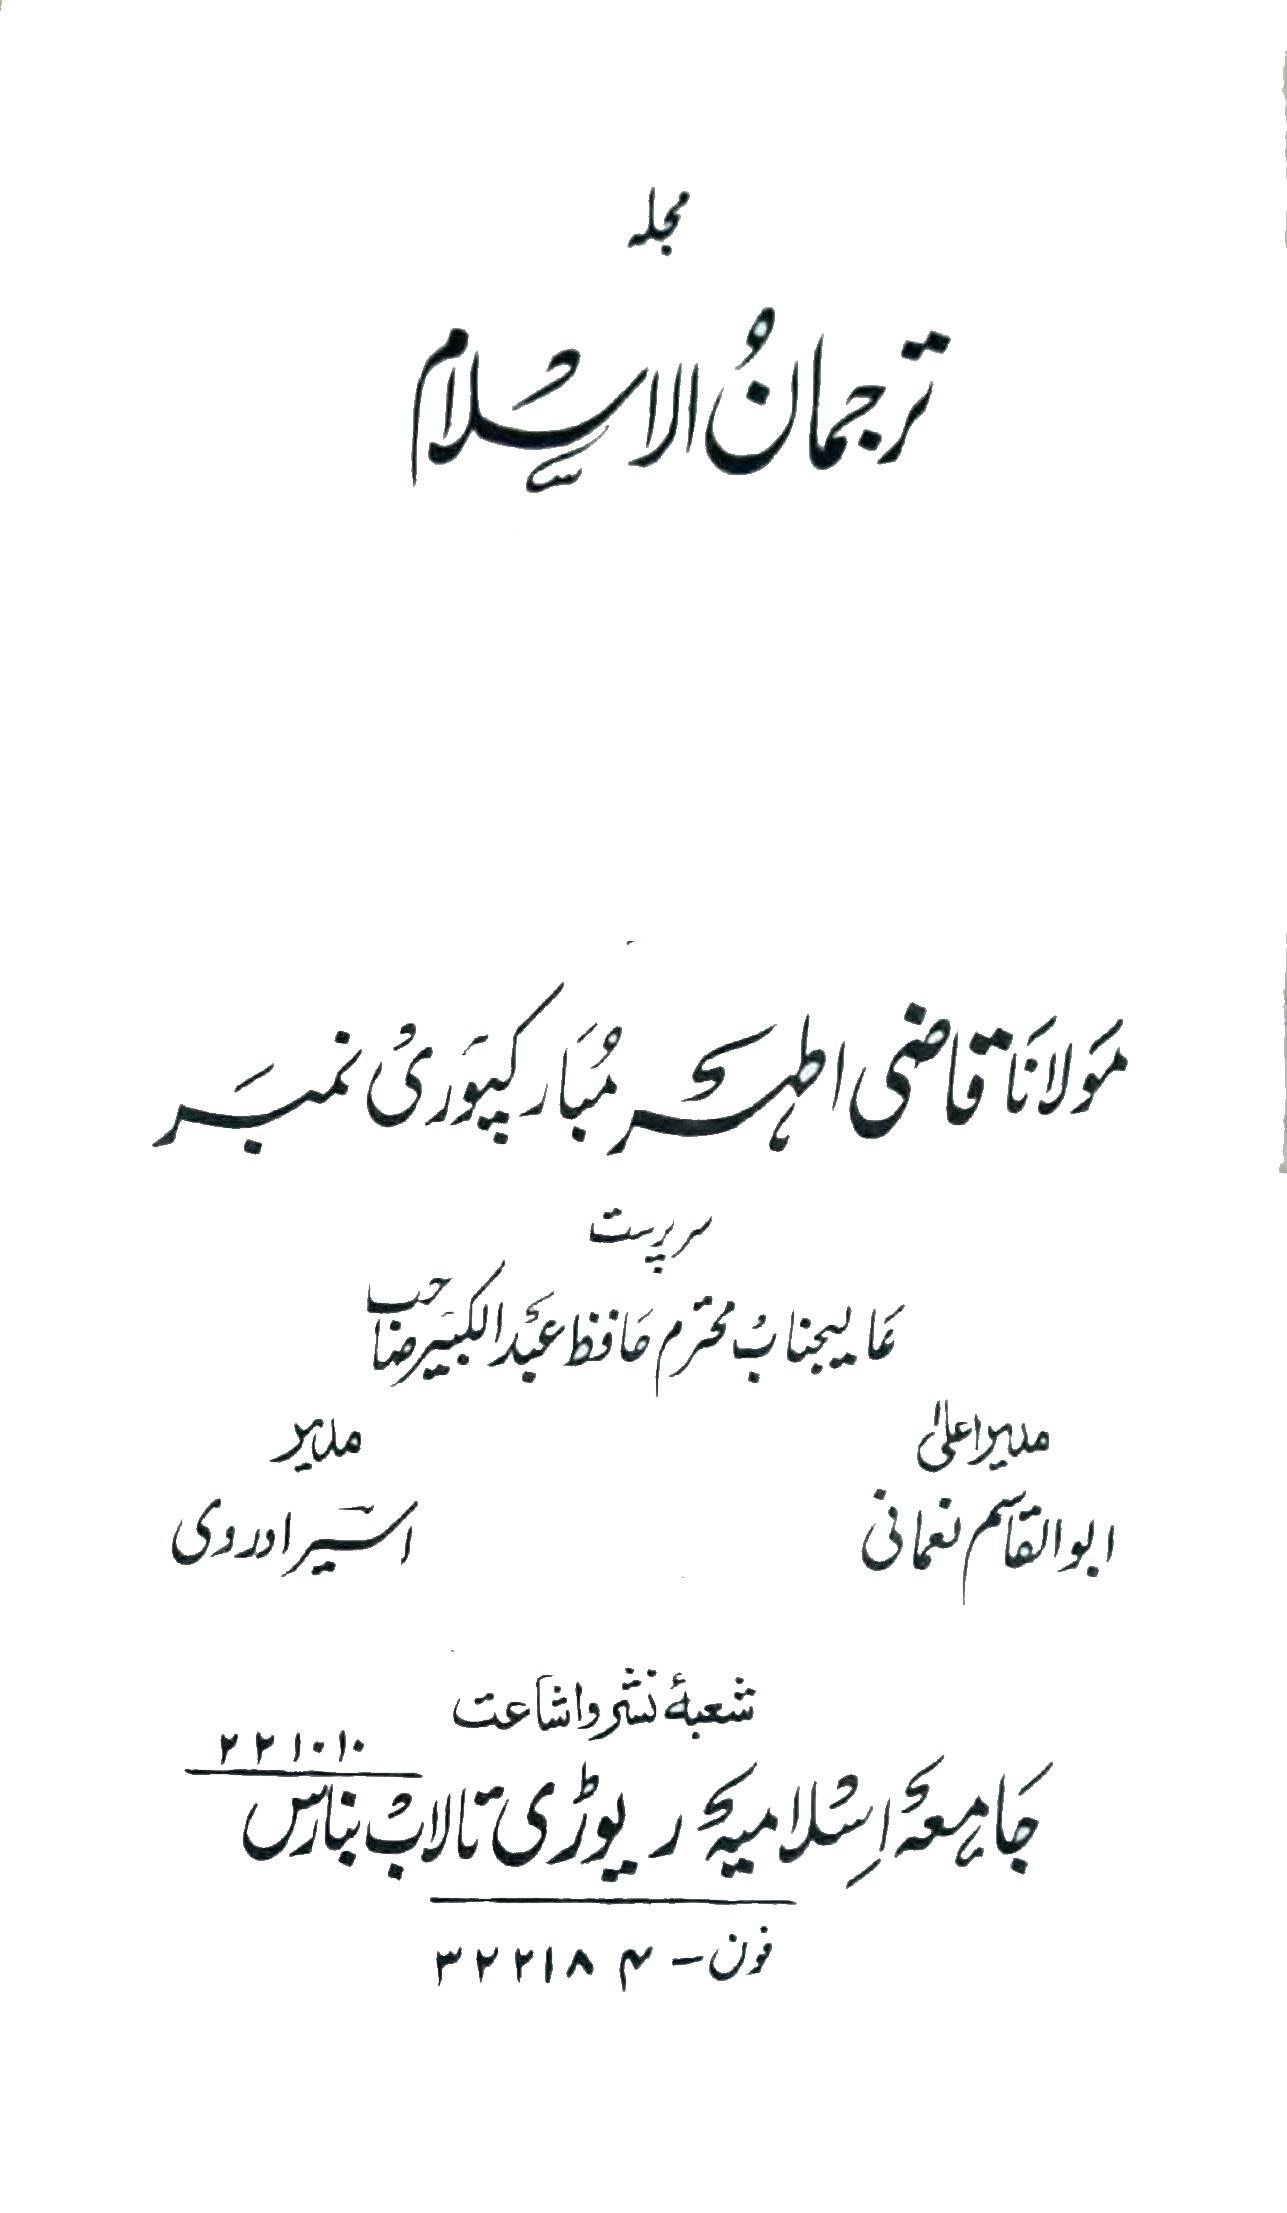 Mujallah Tarjuman ul Islam - Qazi Athar Mubarakpuri ra Number